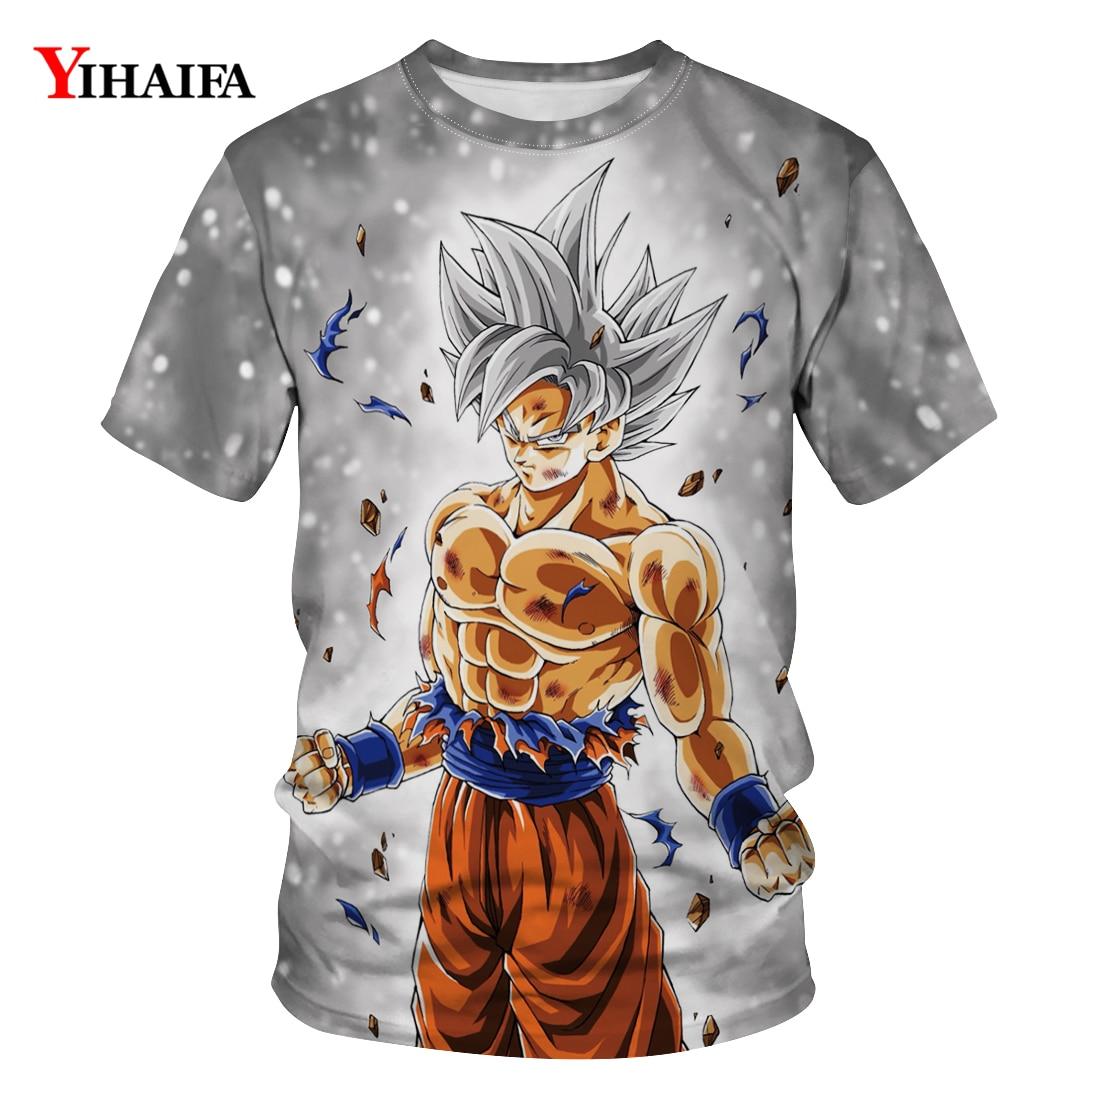 T Shirt Men Harajuku Dragon Ball Z T-shirt Figthing Goku 3D Printed T-shirts Mens Womens Casual Tees Unisex Tops